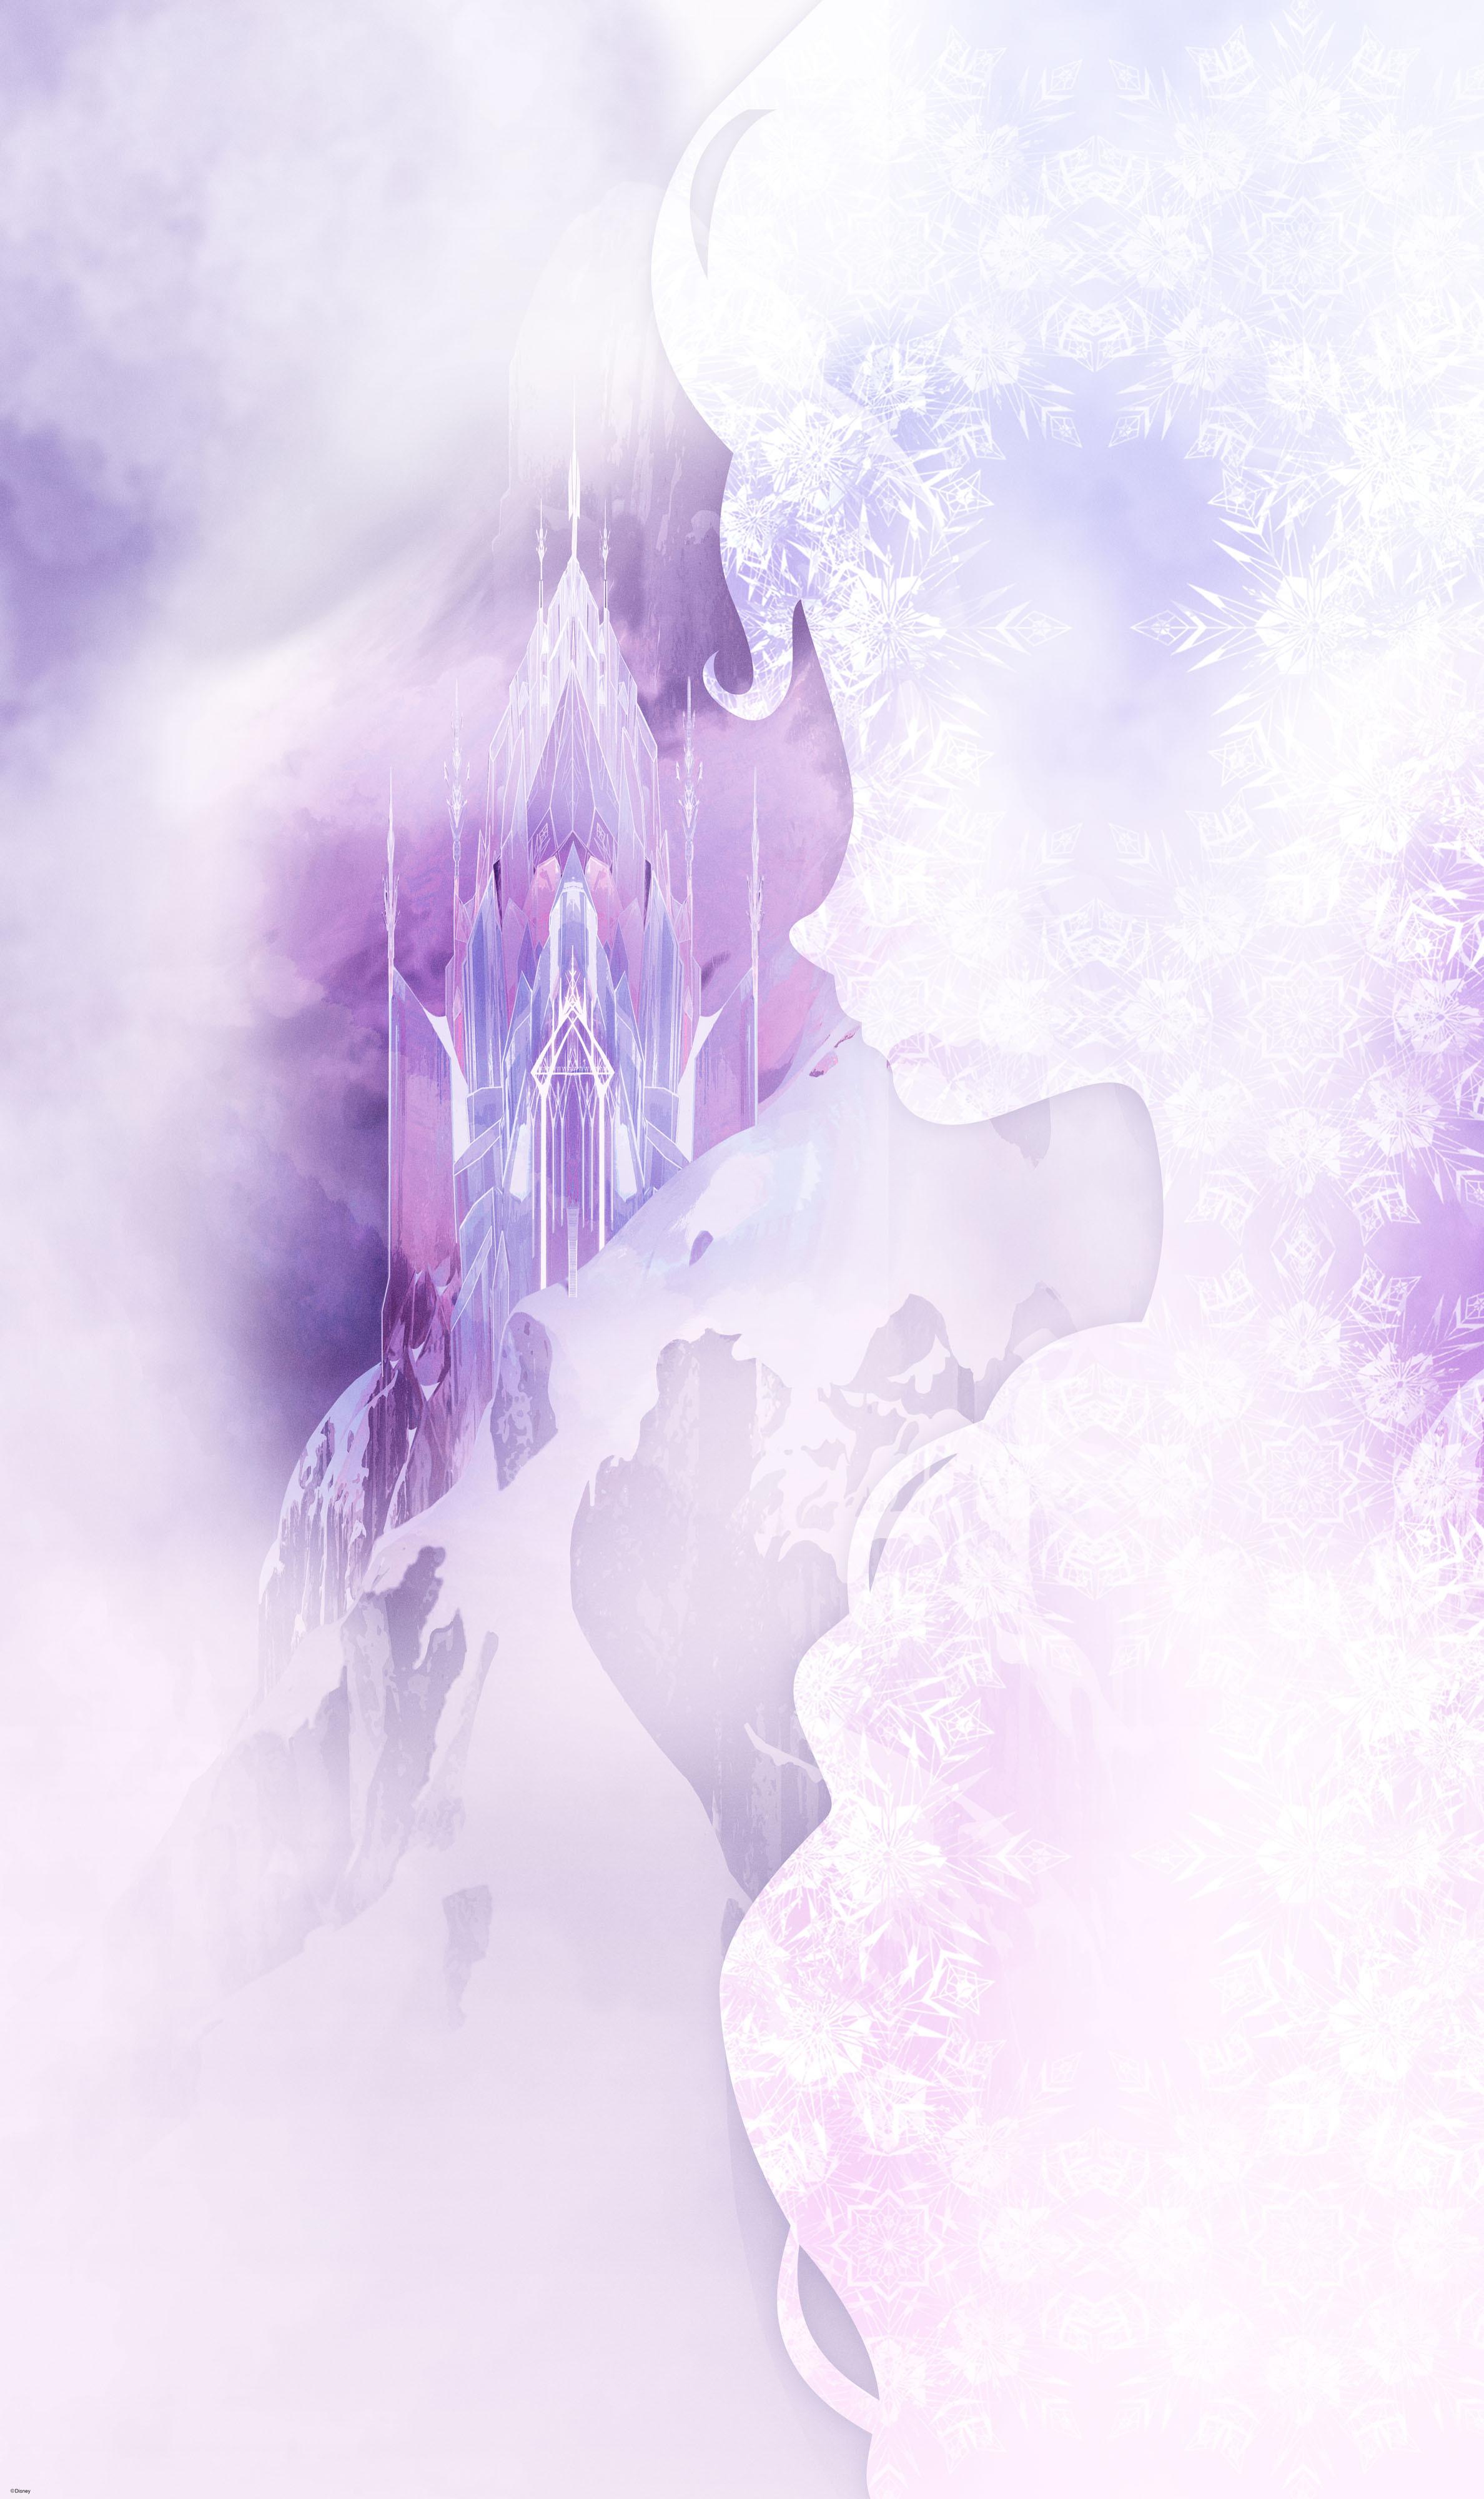 Frozen Winter Mist